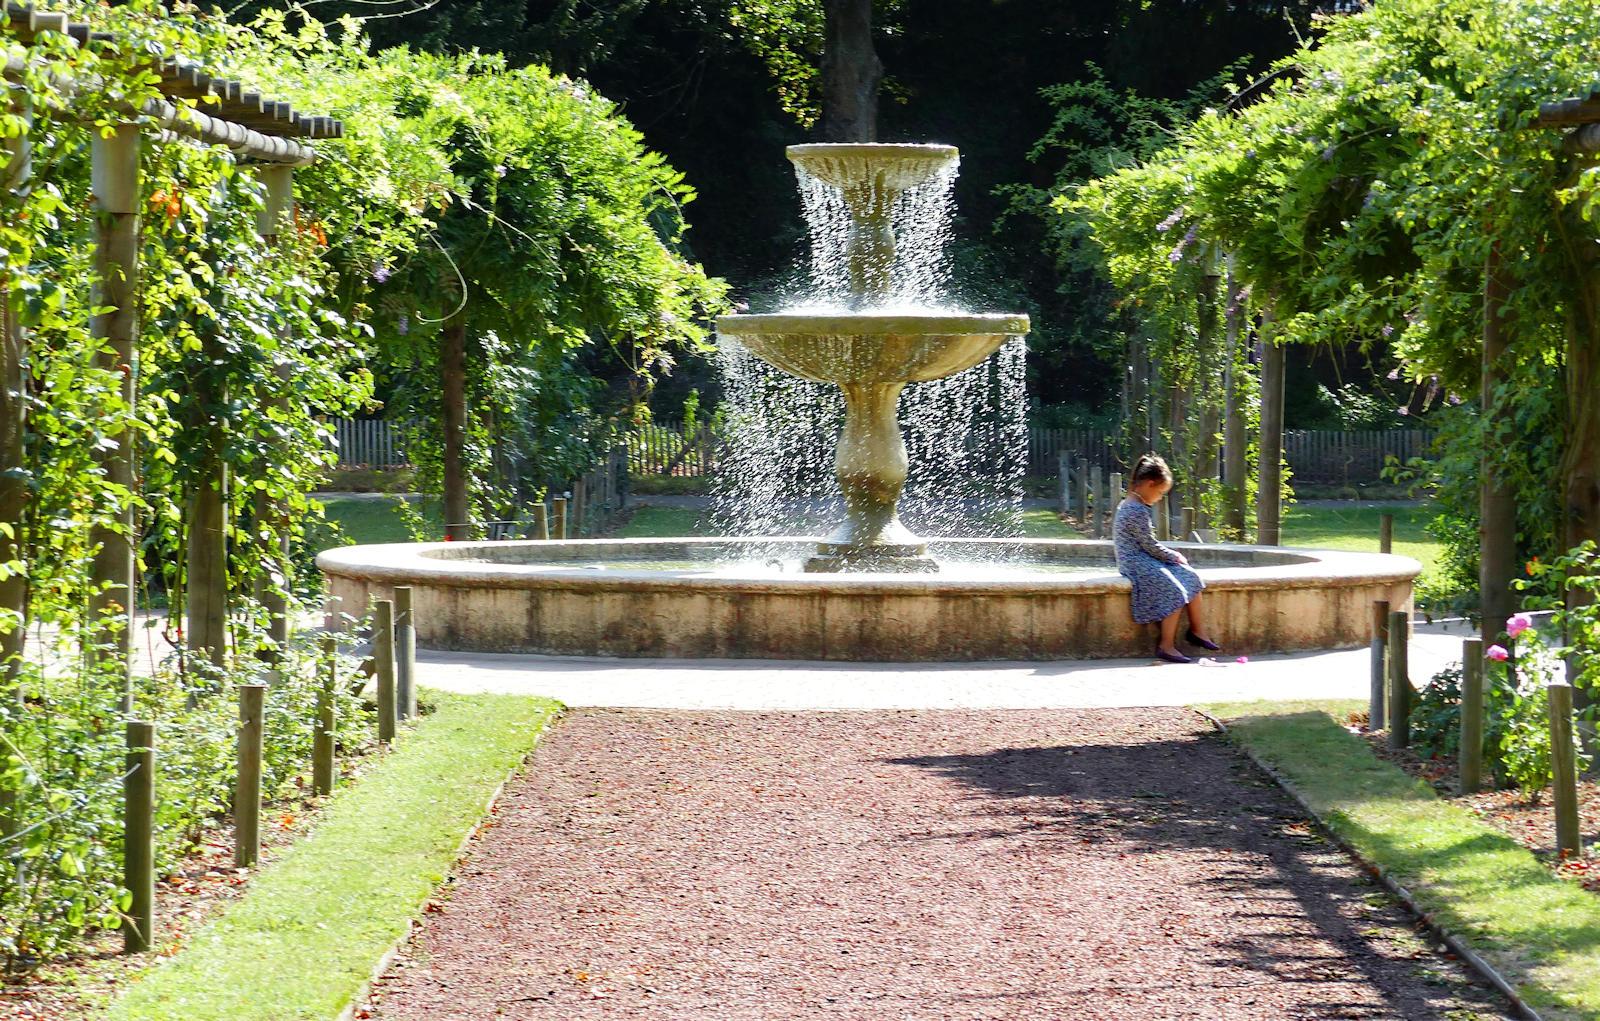 Jardin botanique, Tourcoing - Fontaine